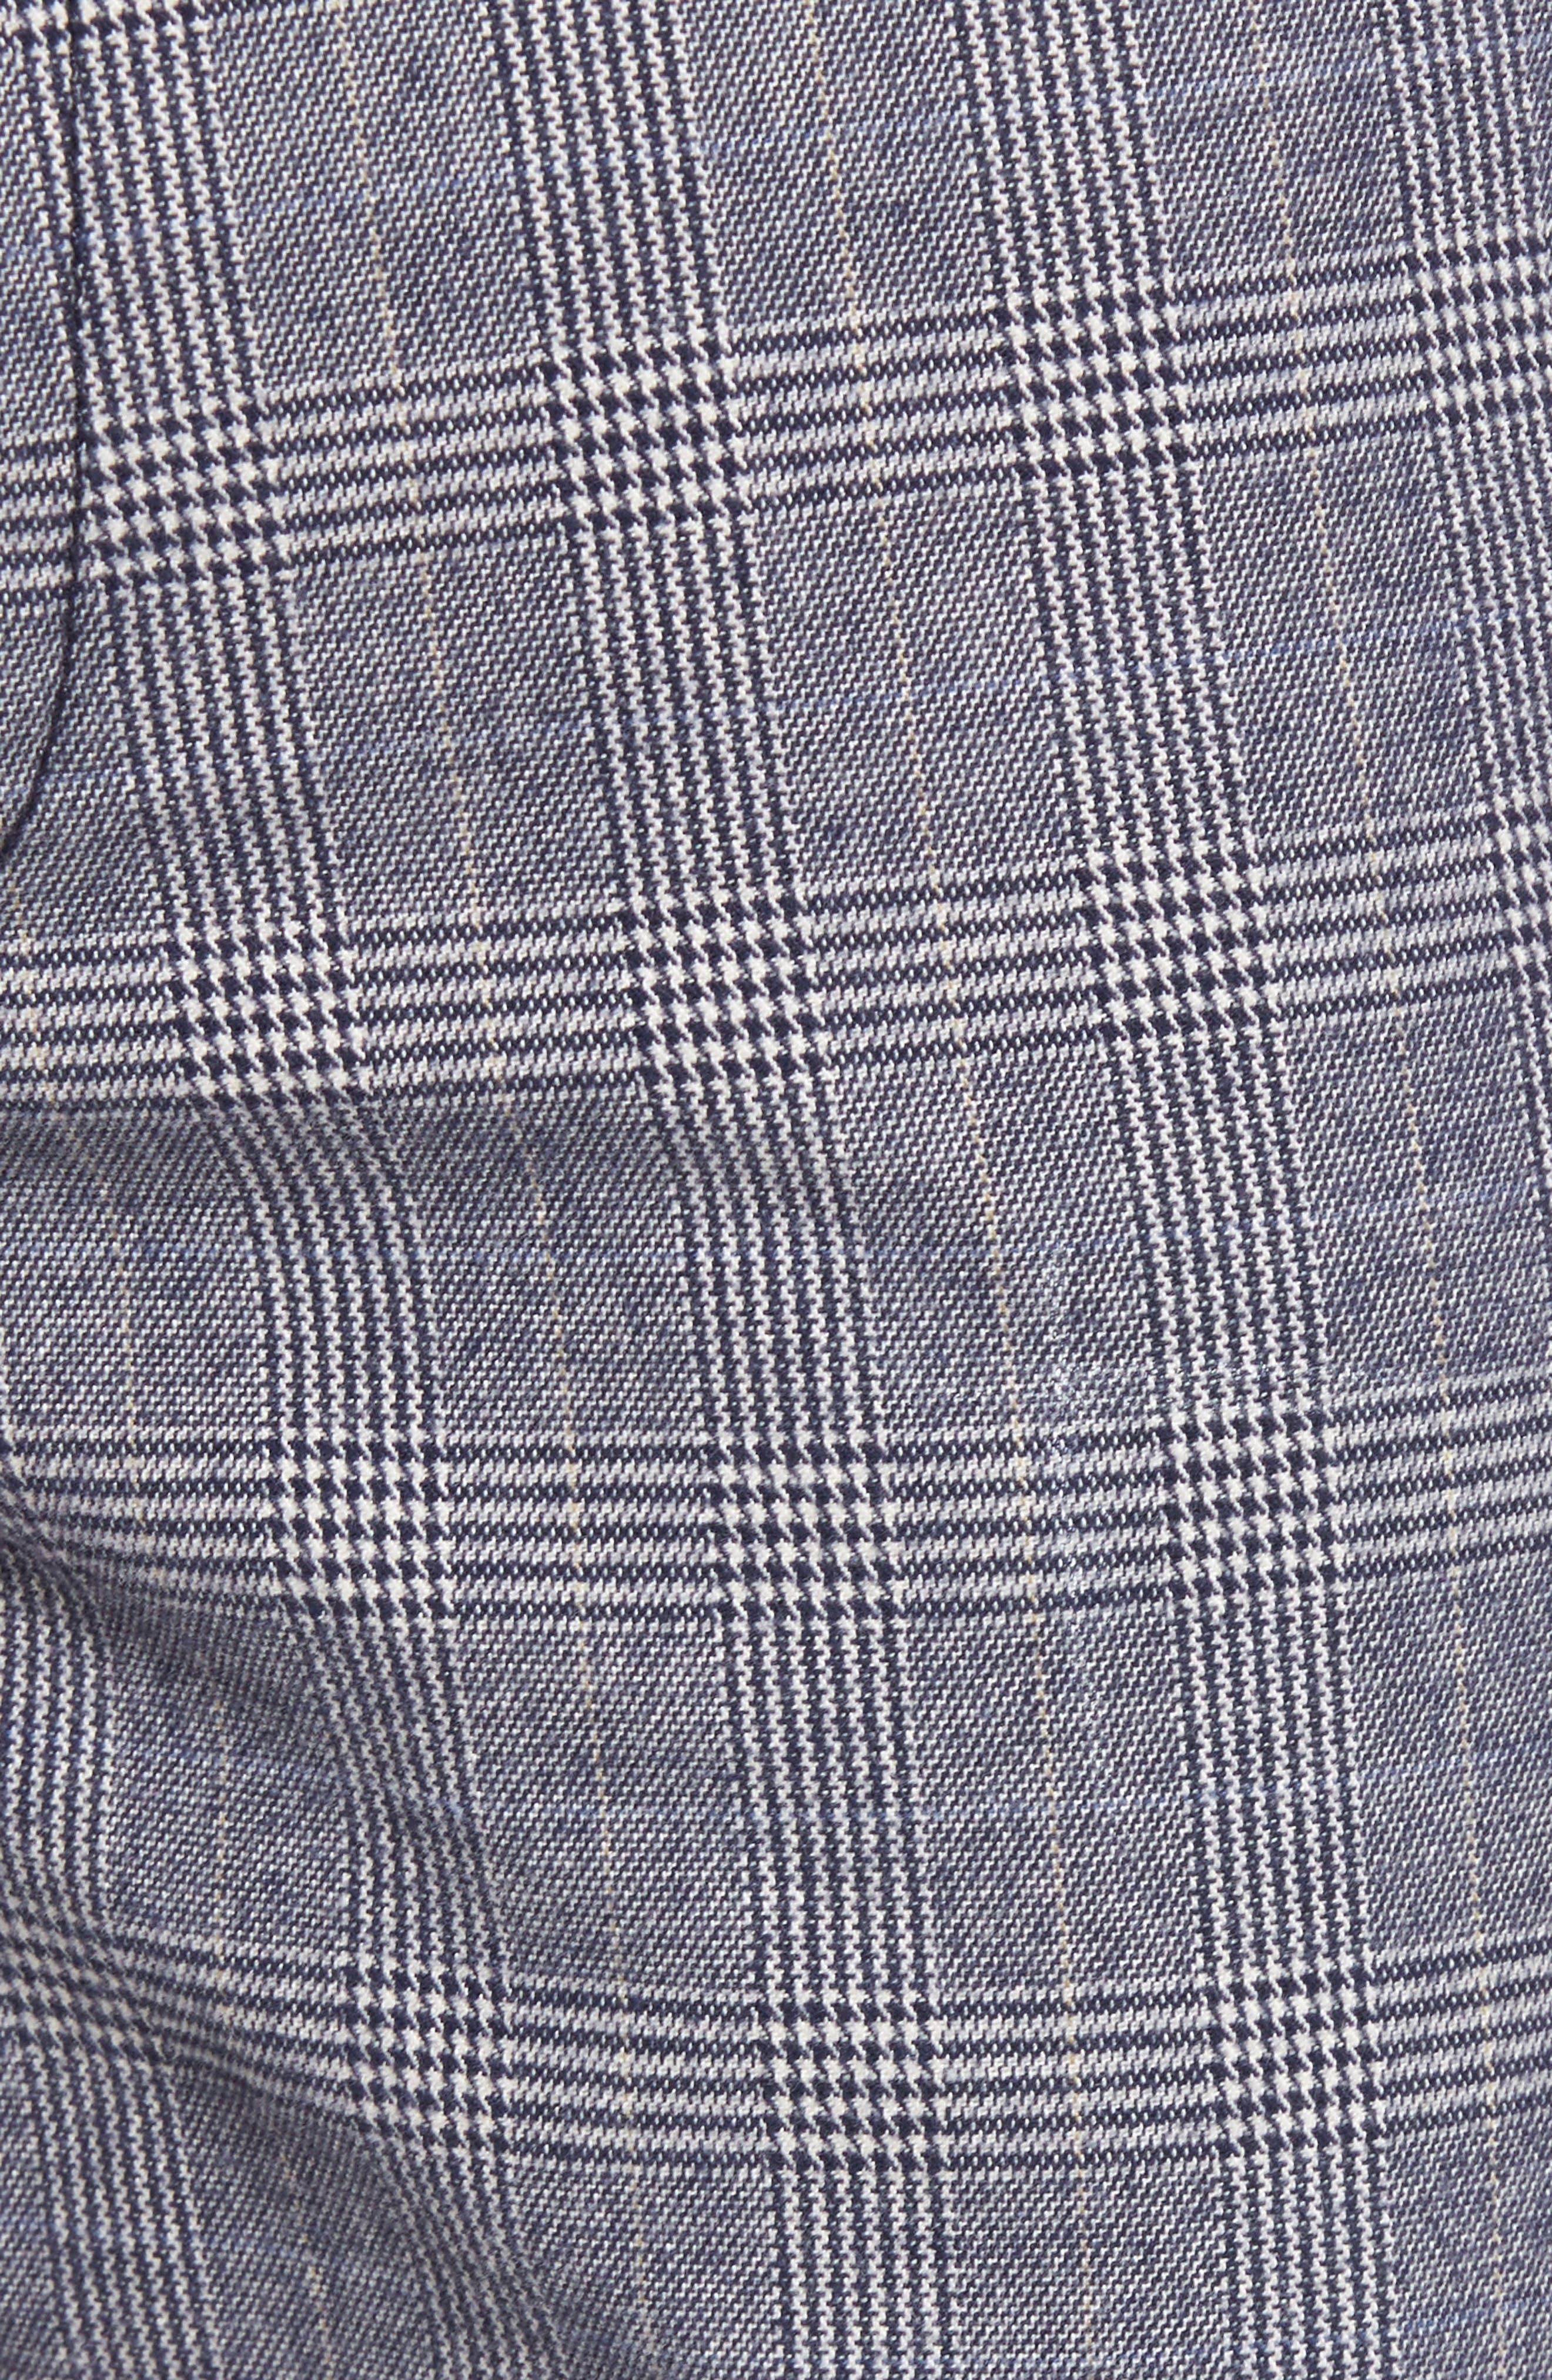 Marshall Slim Fit Pants,                             Alternate thumbnail 15, color,